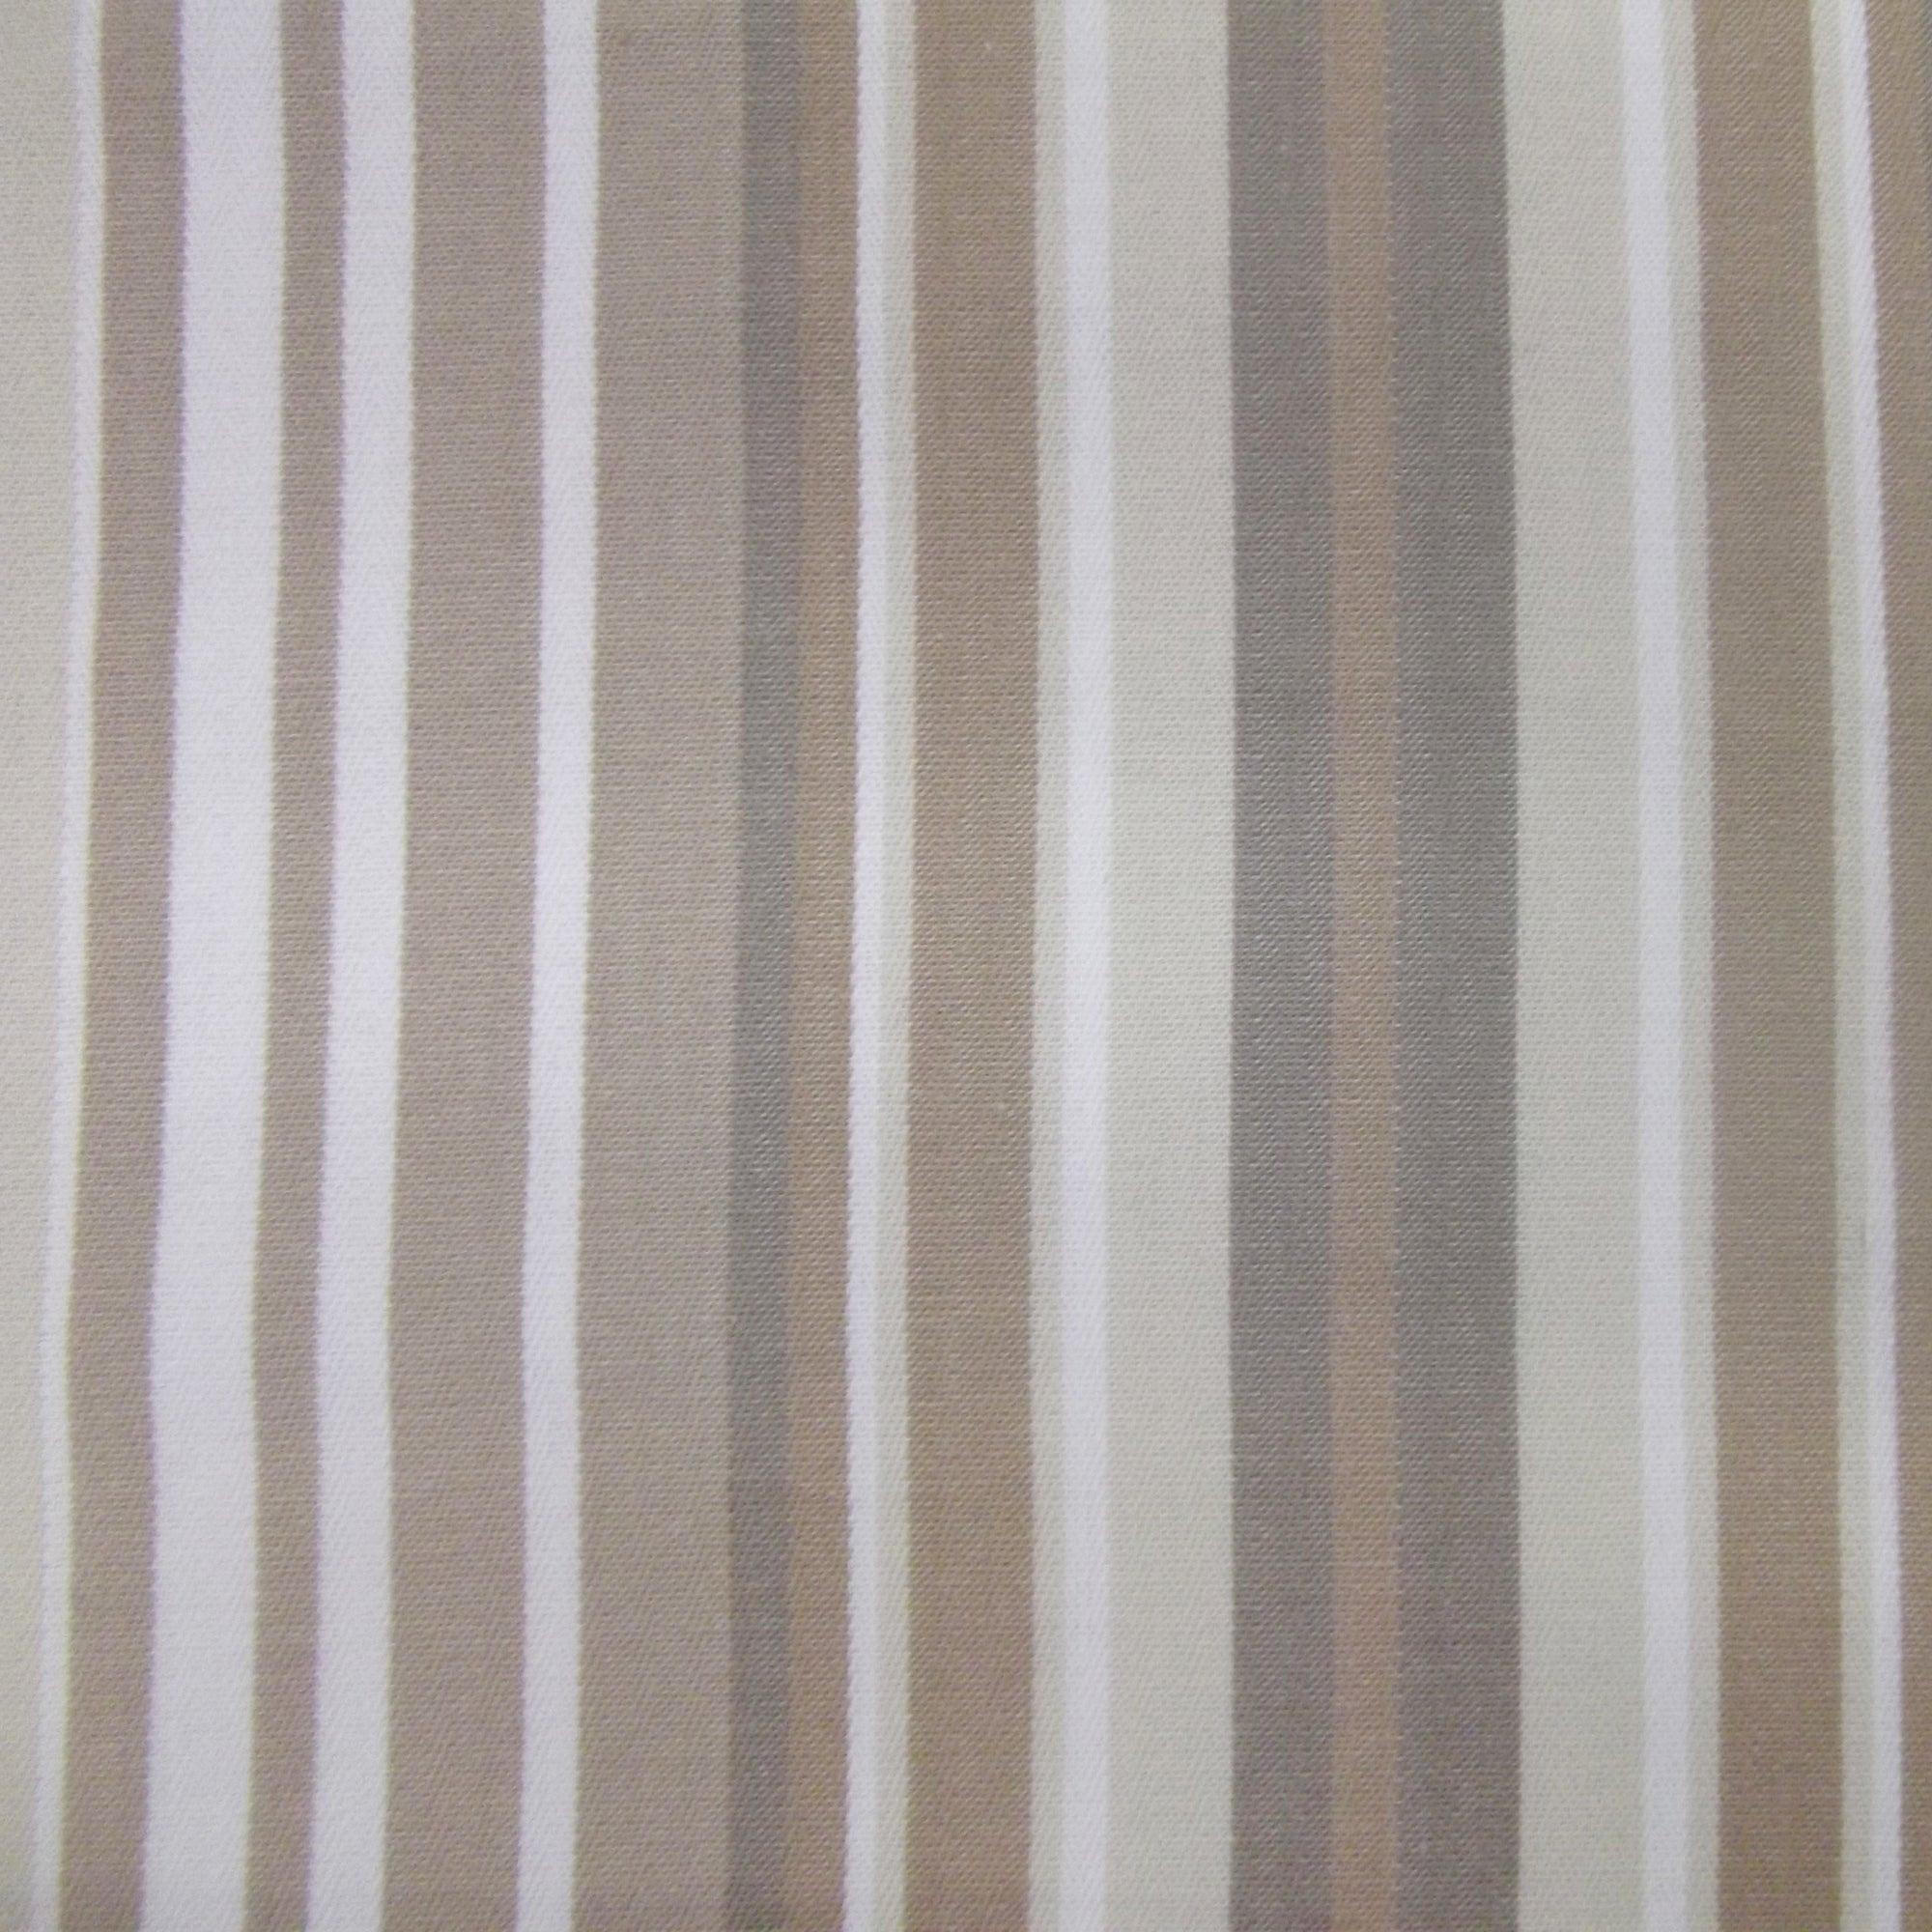 Beachcomber Fabric